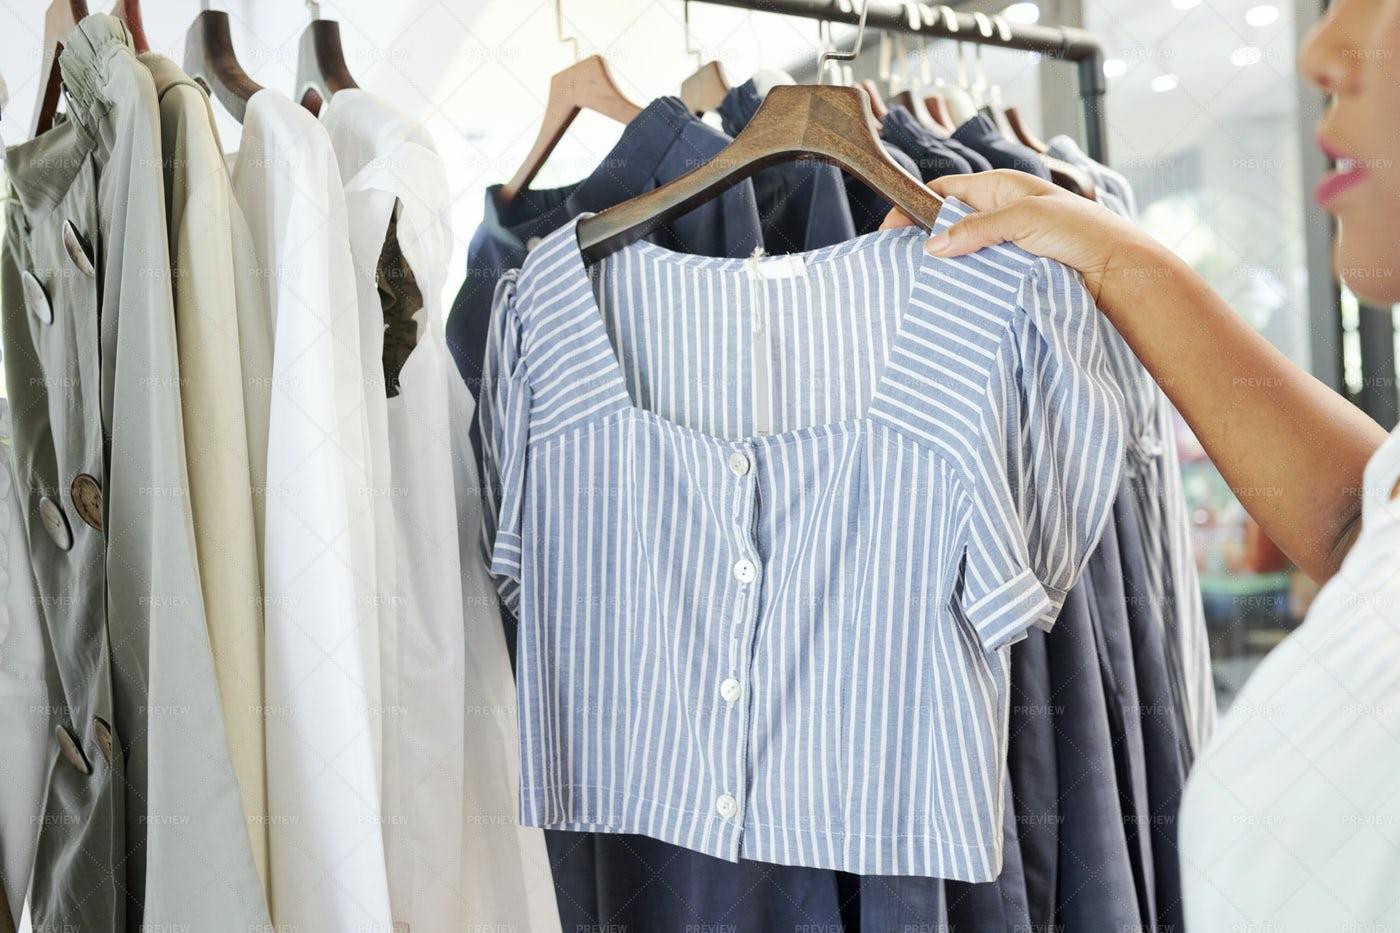 Woman Choosing Blouse On Clothing Rack: Stock Photos